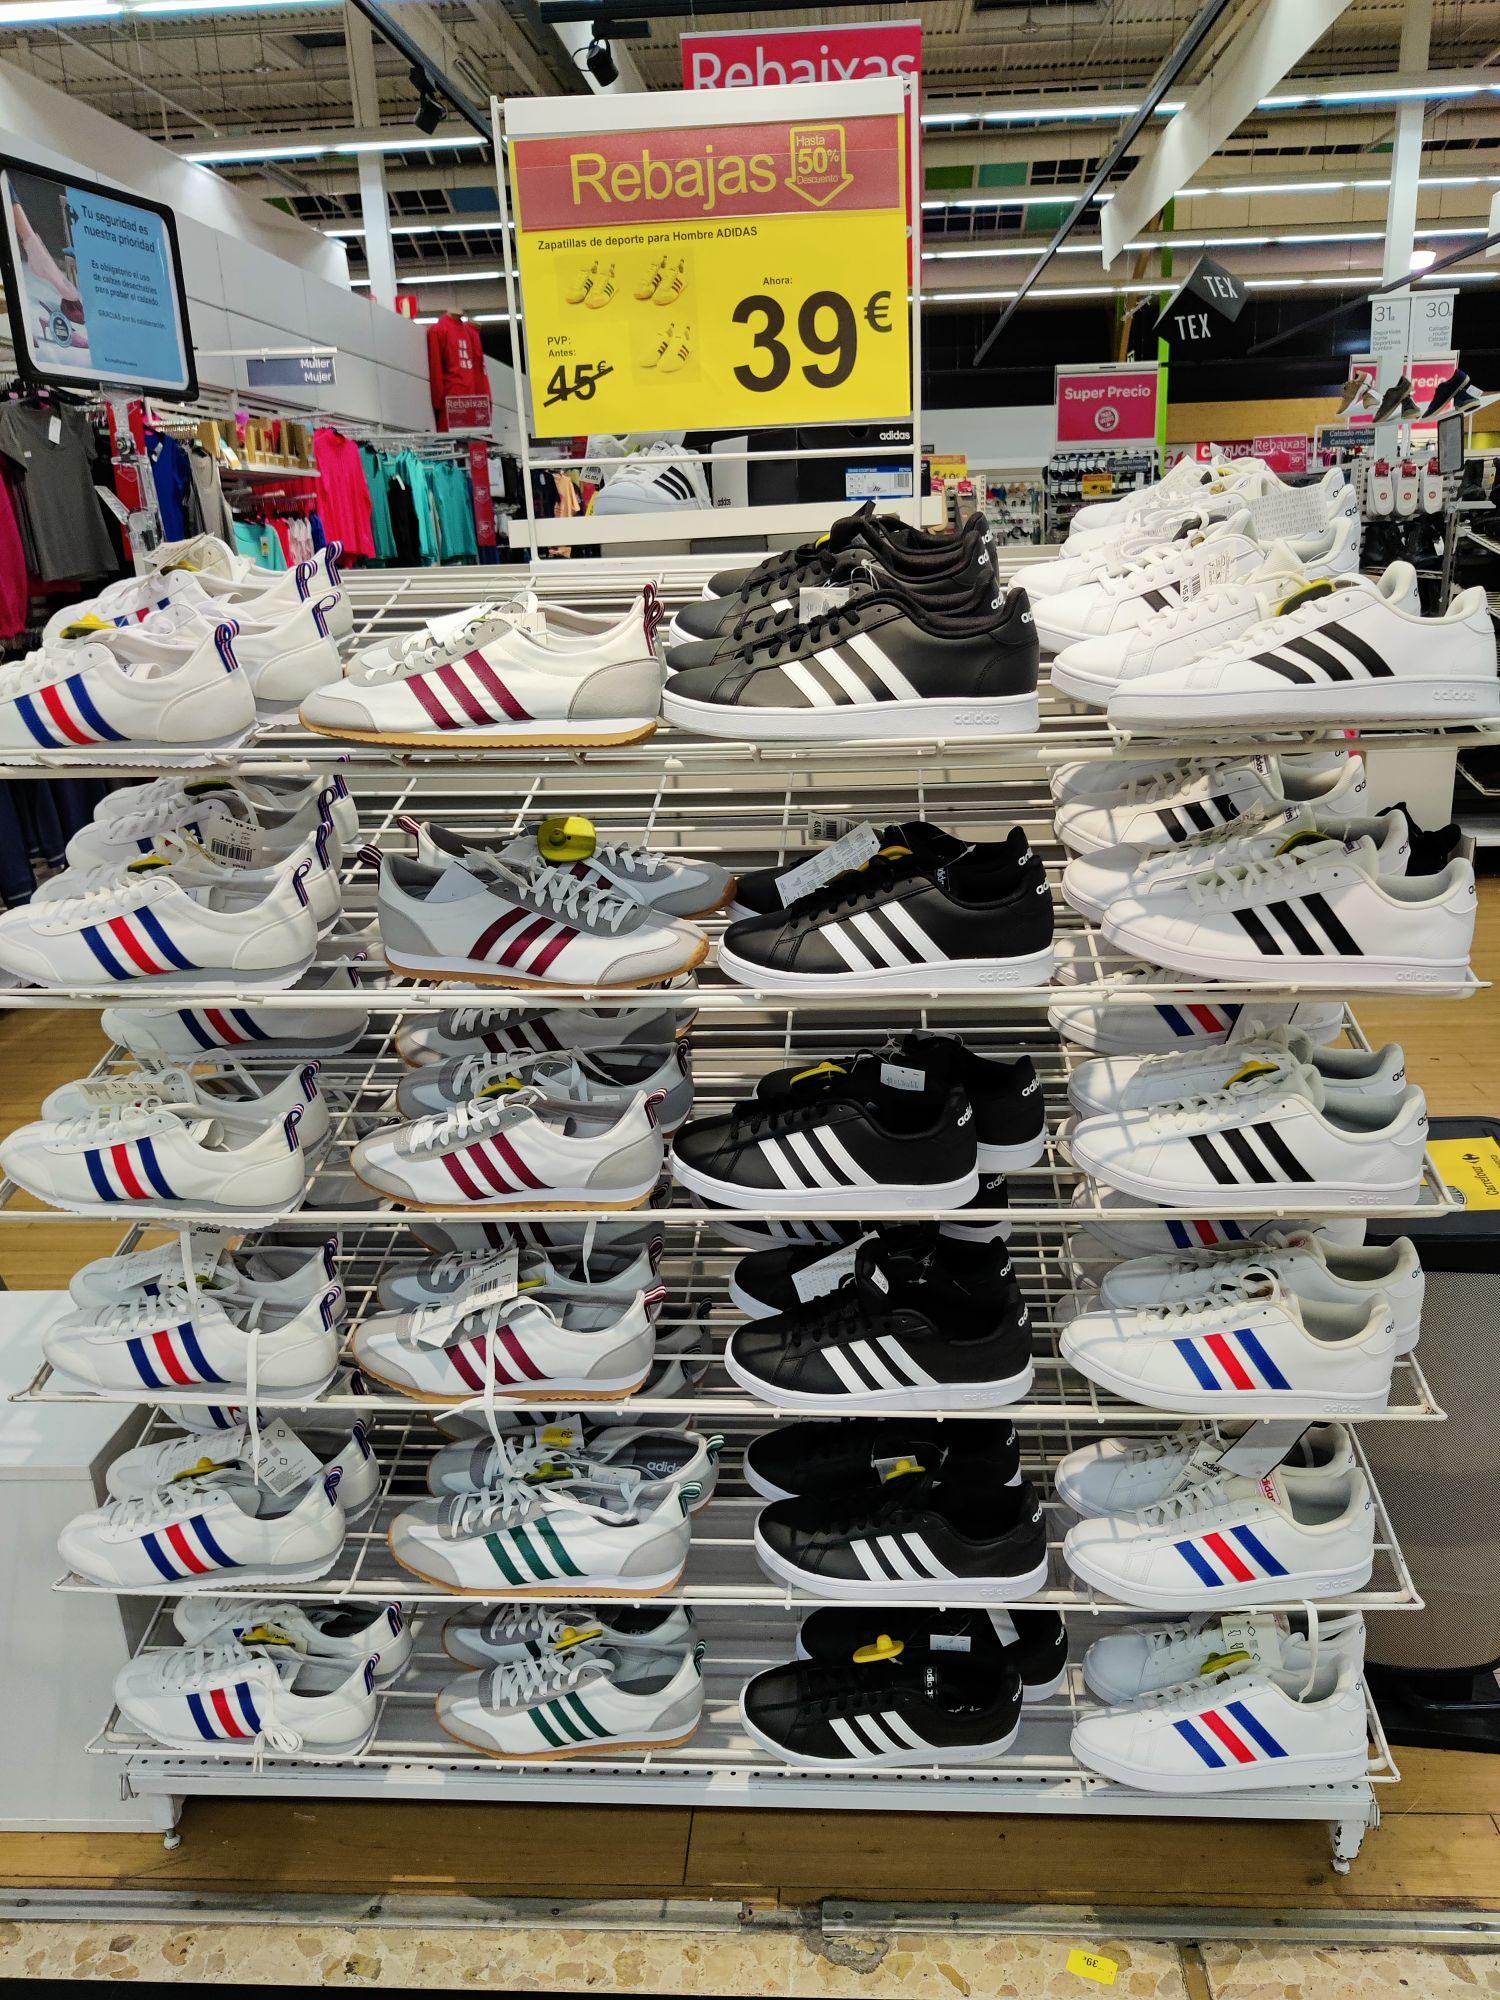 Zapatillas ADIDAS Retro Carrefour (recogida o web)